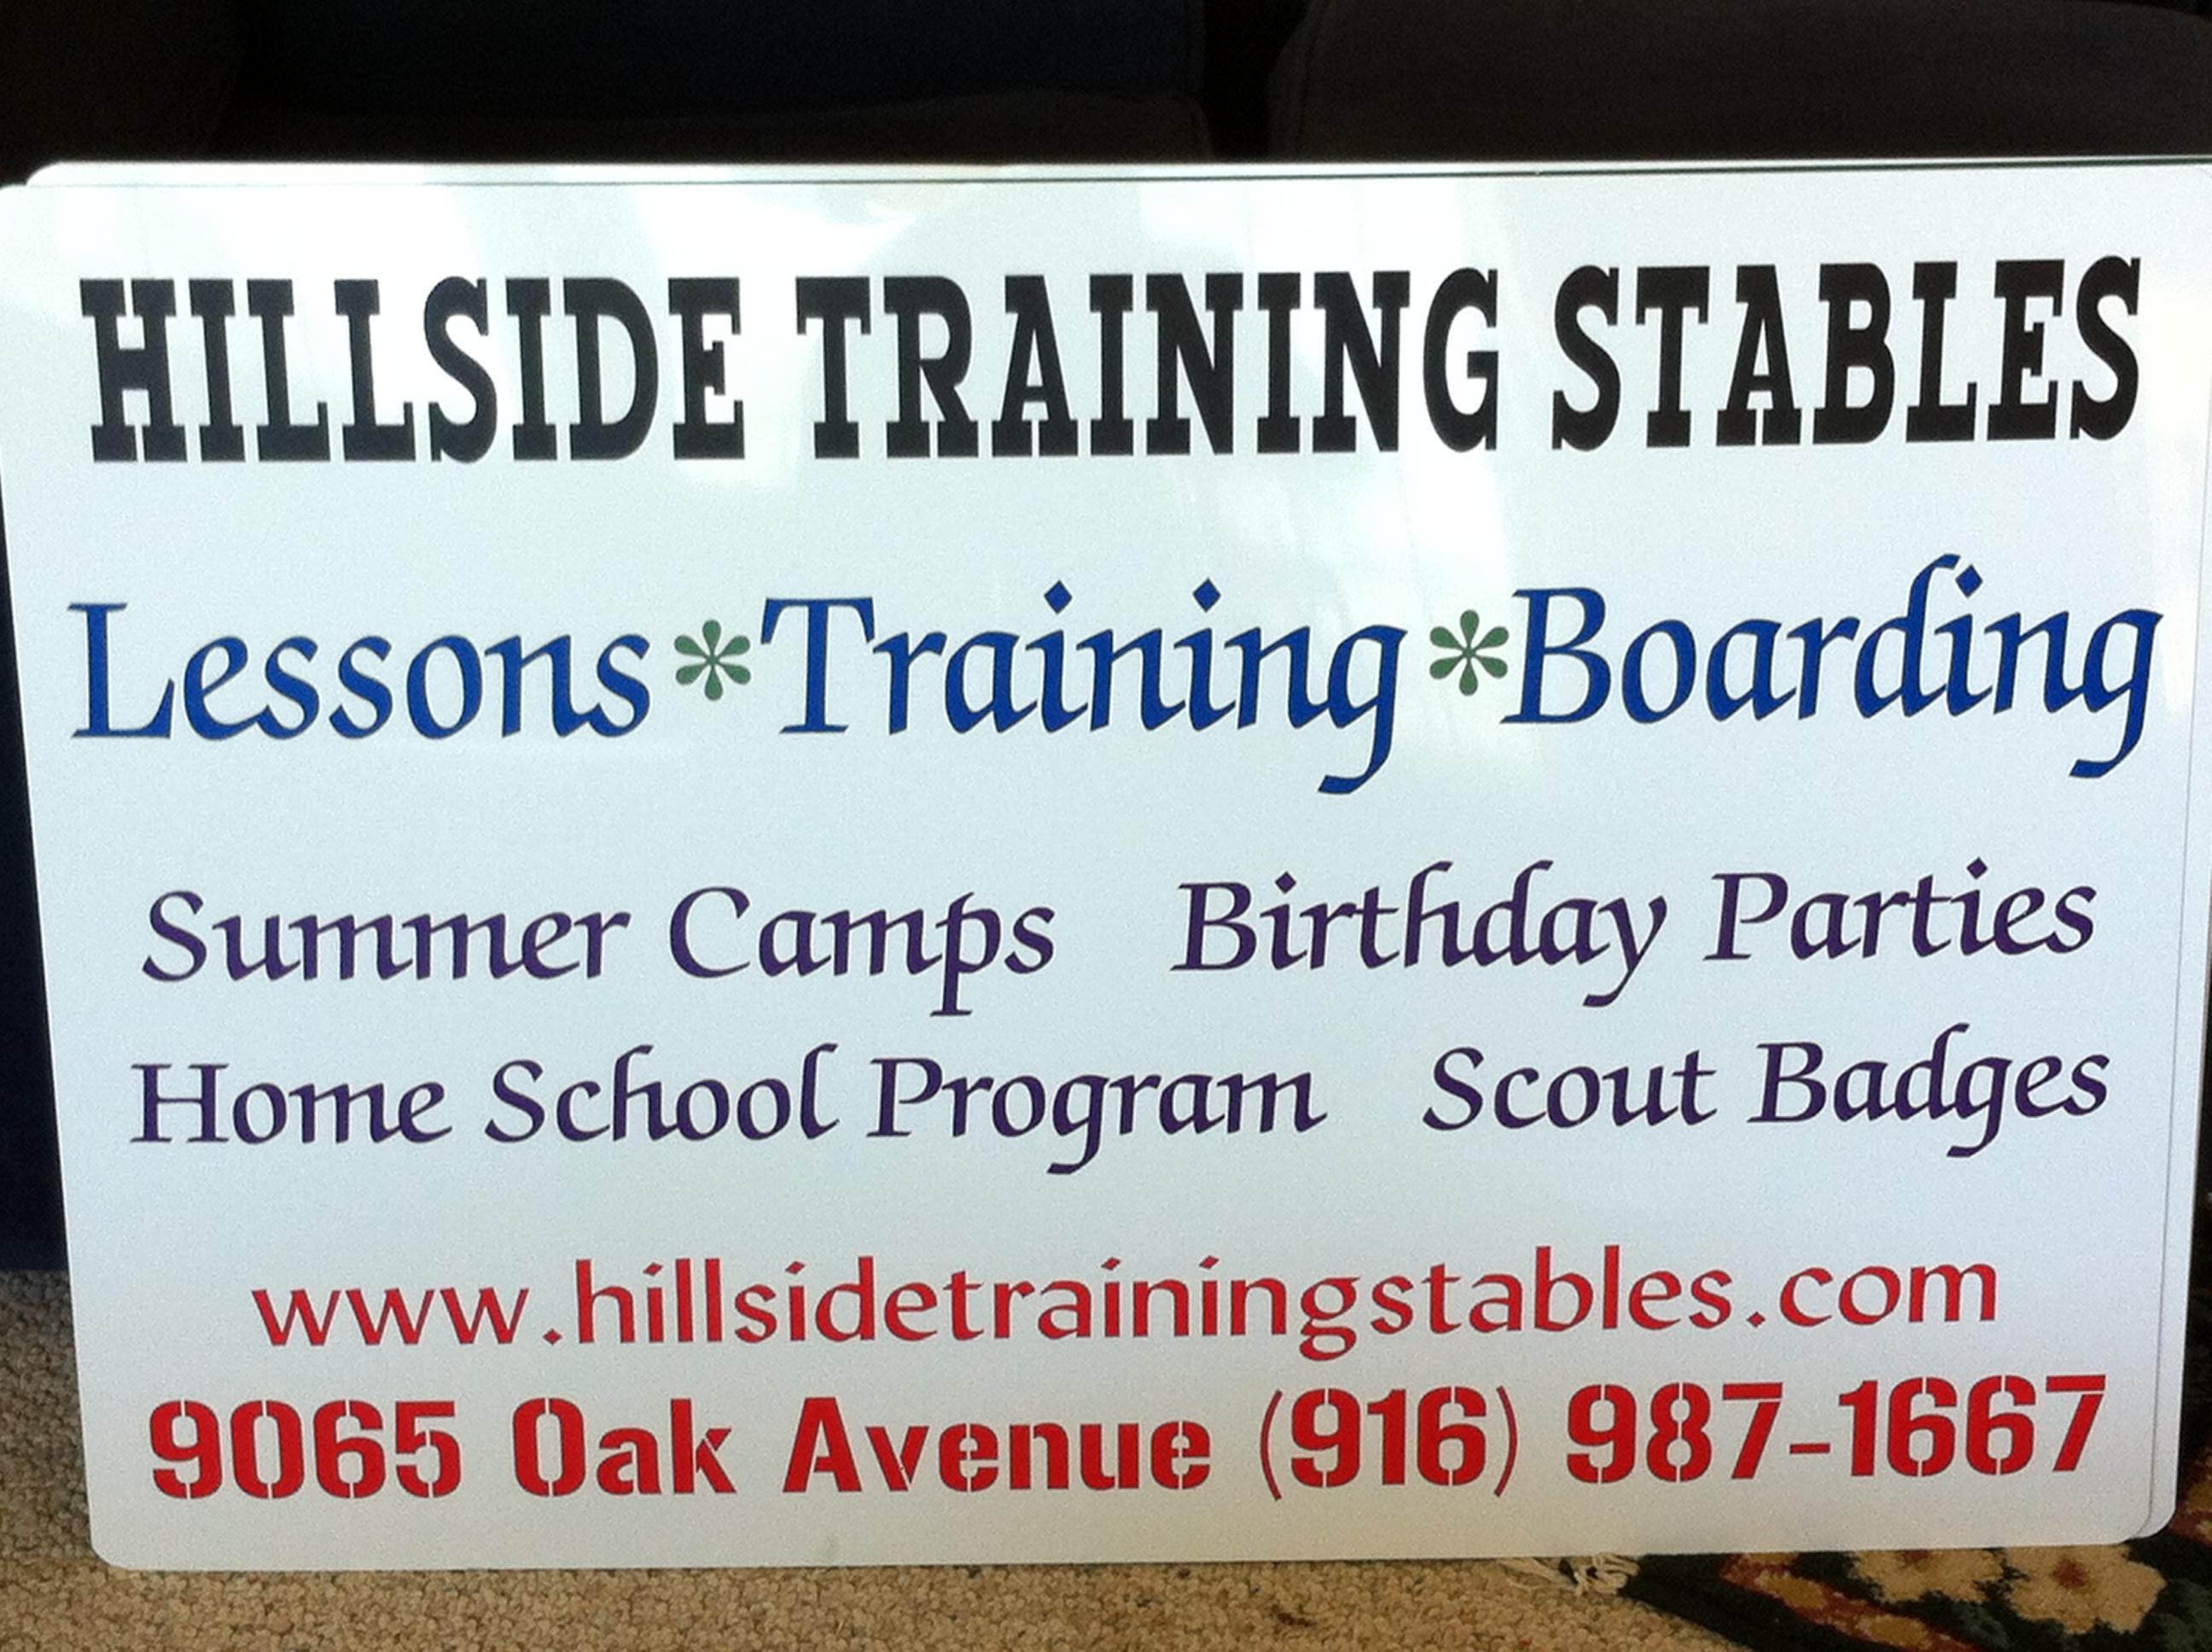 Hillside Training Stables in Orangevale, CA